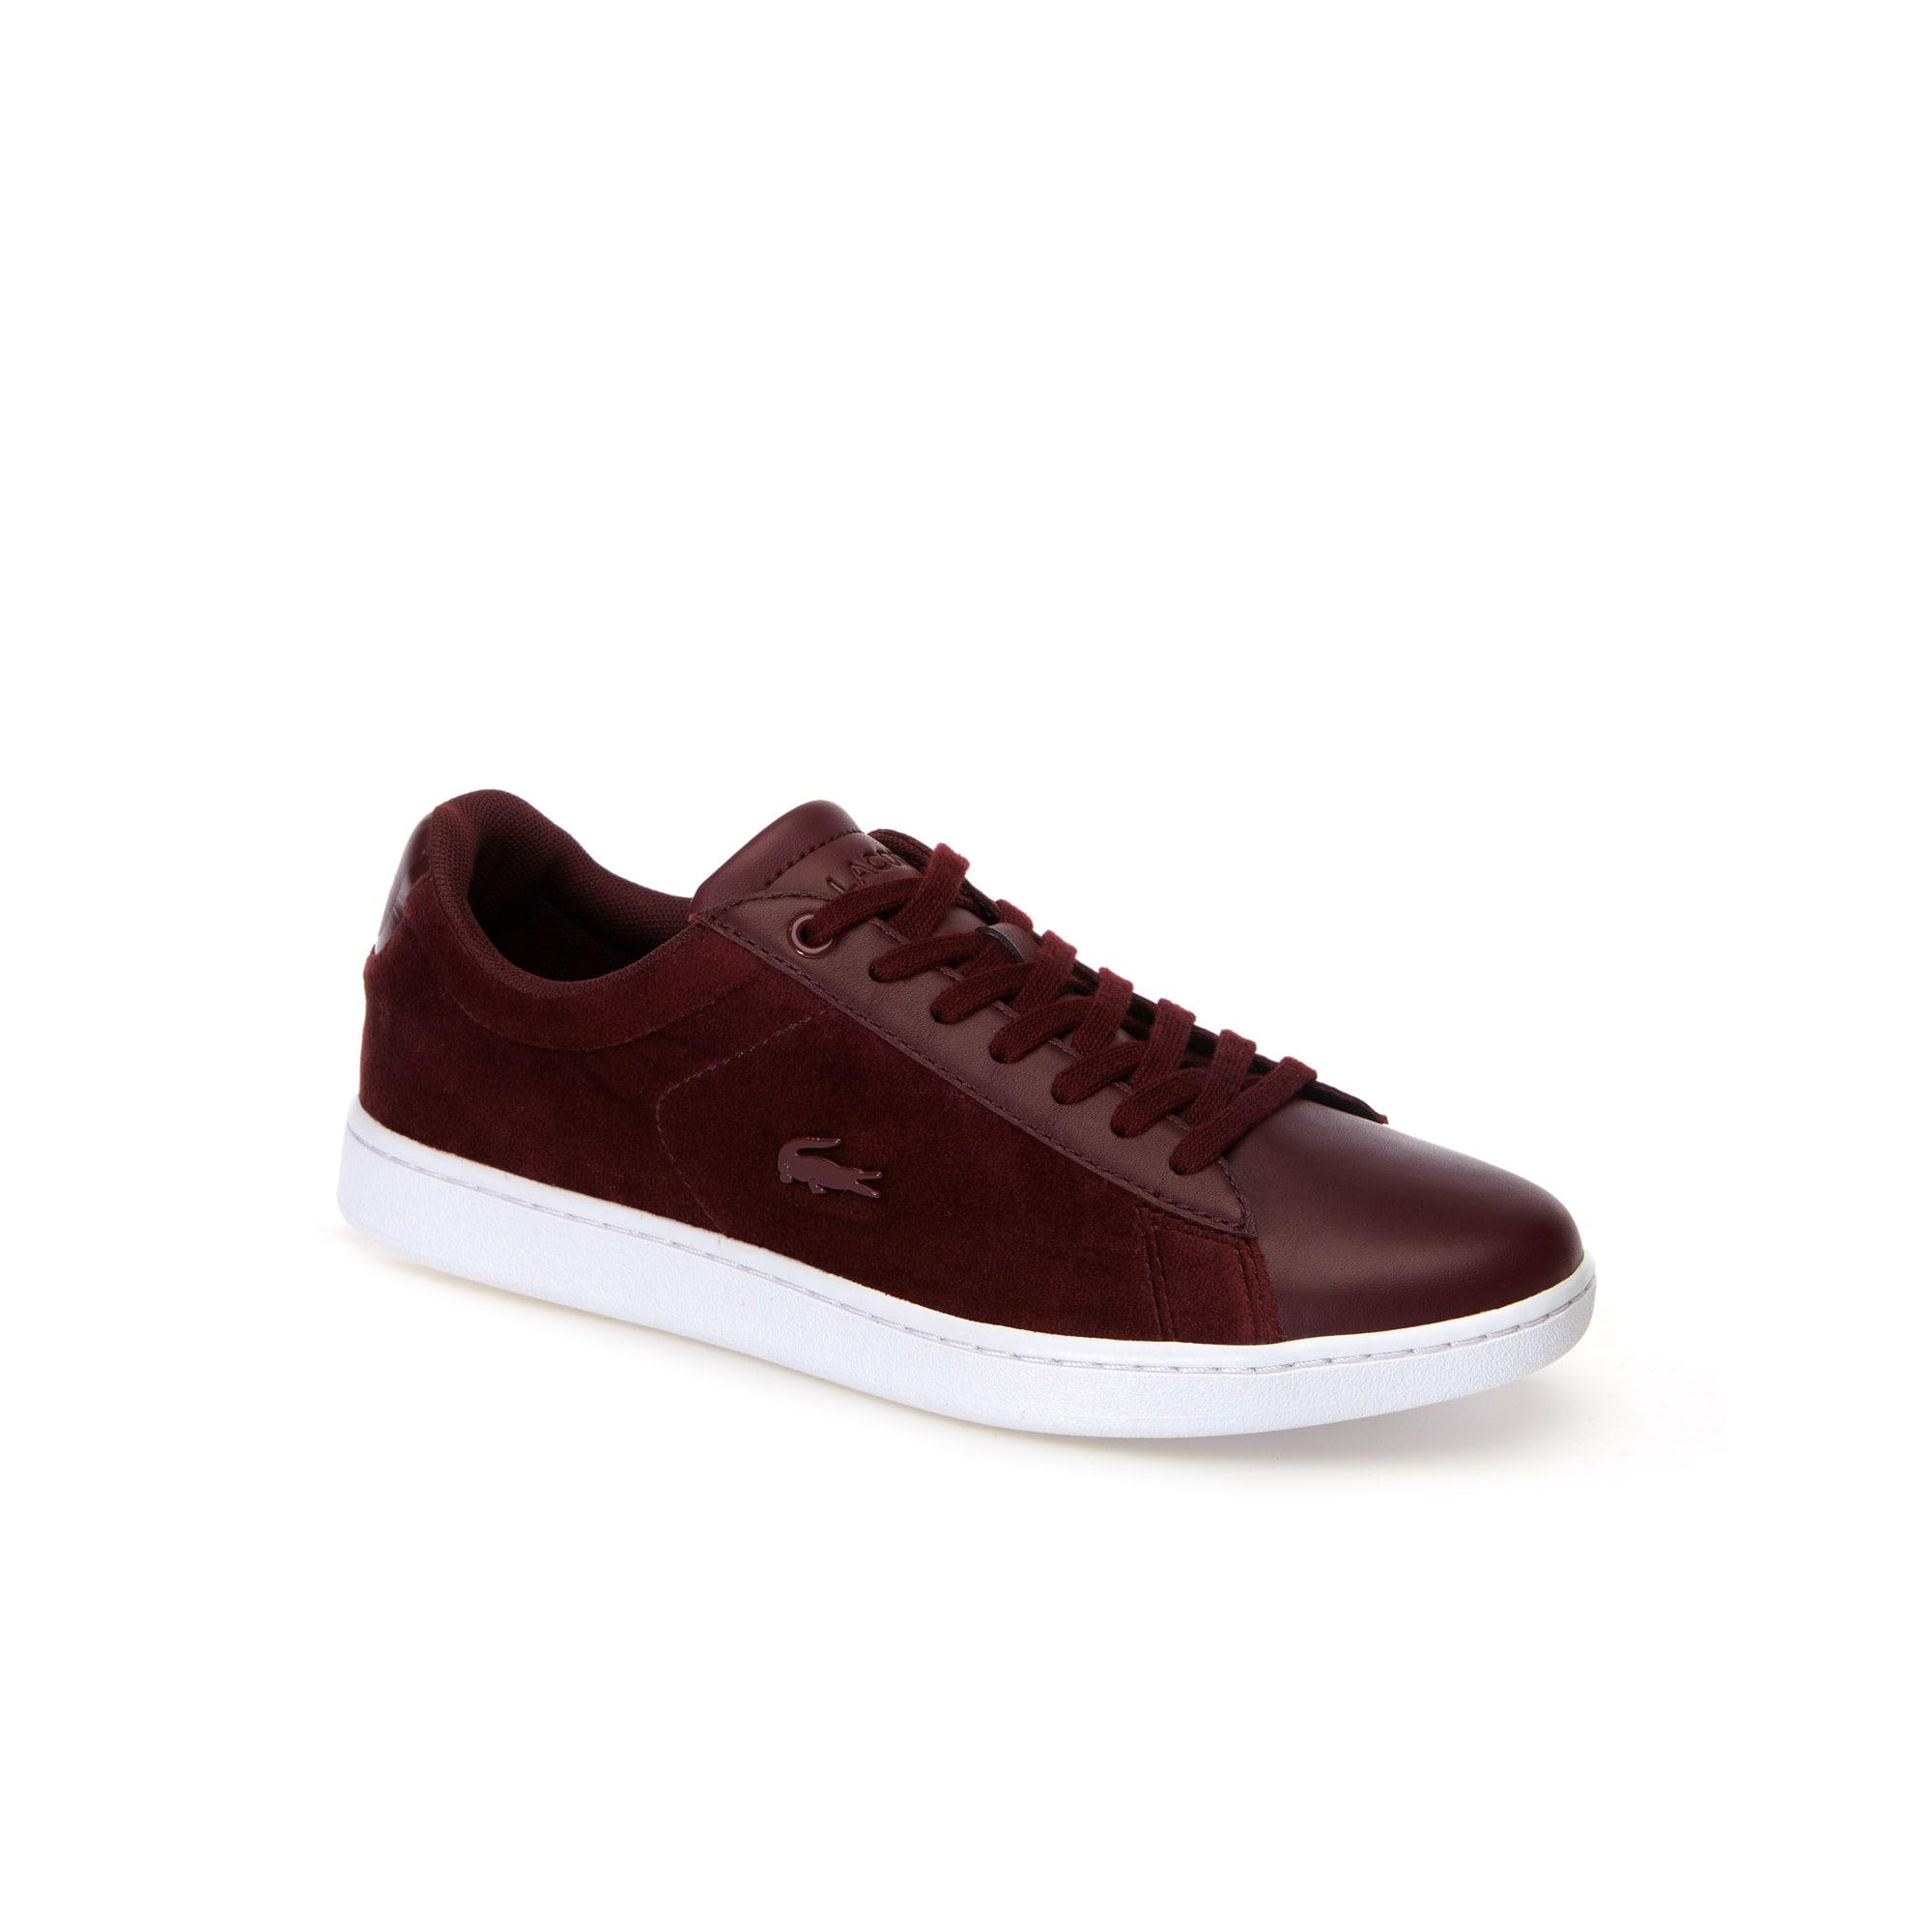 Sneakers Carnaby Evo femme en velours et cuir